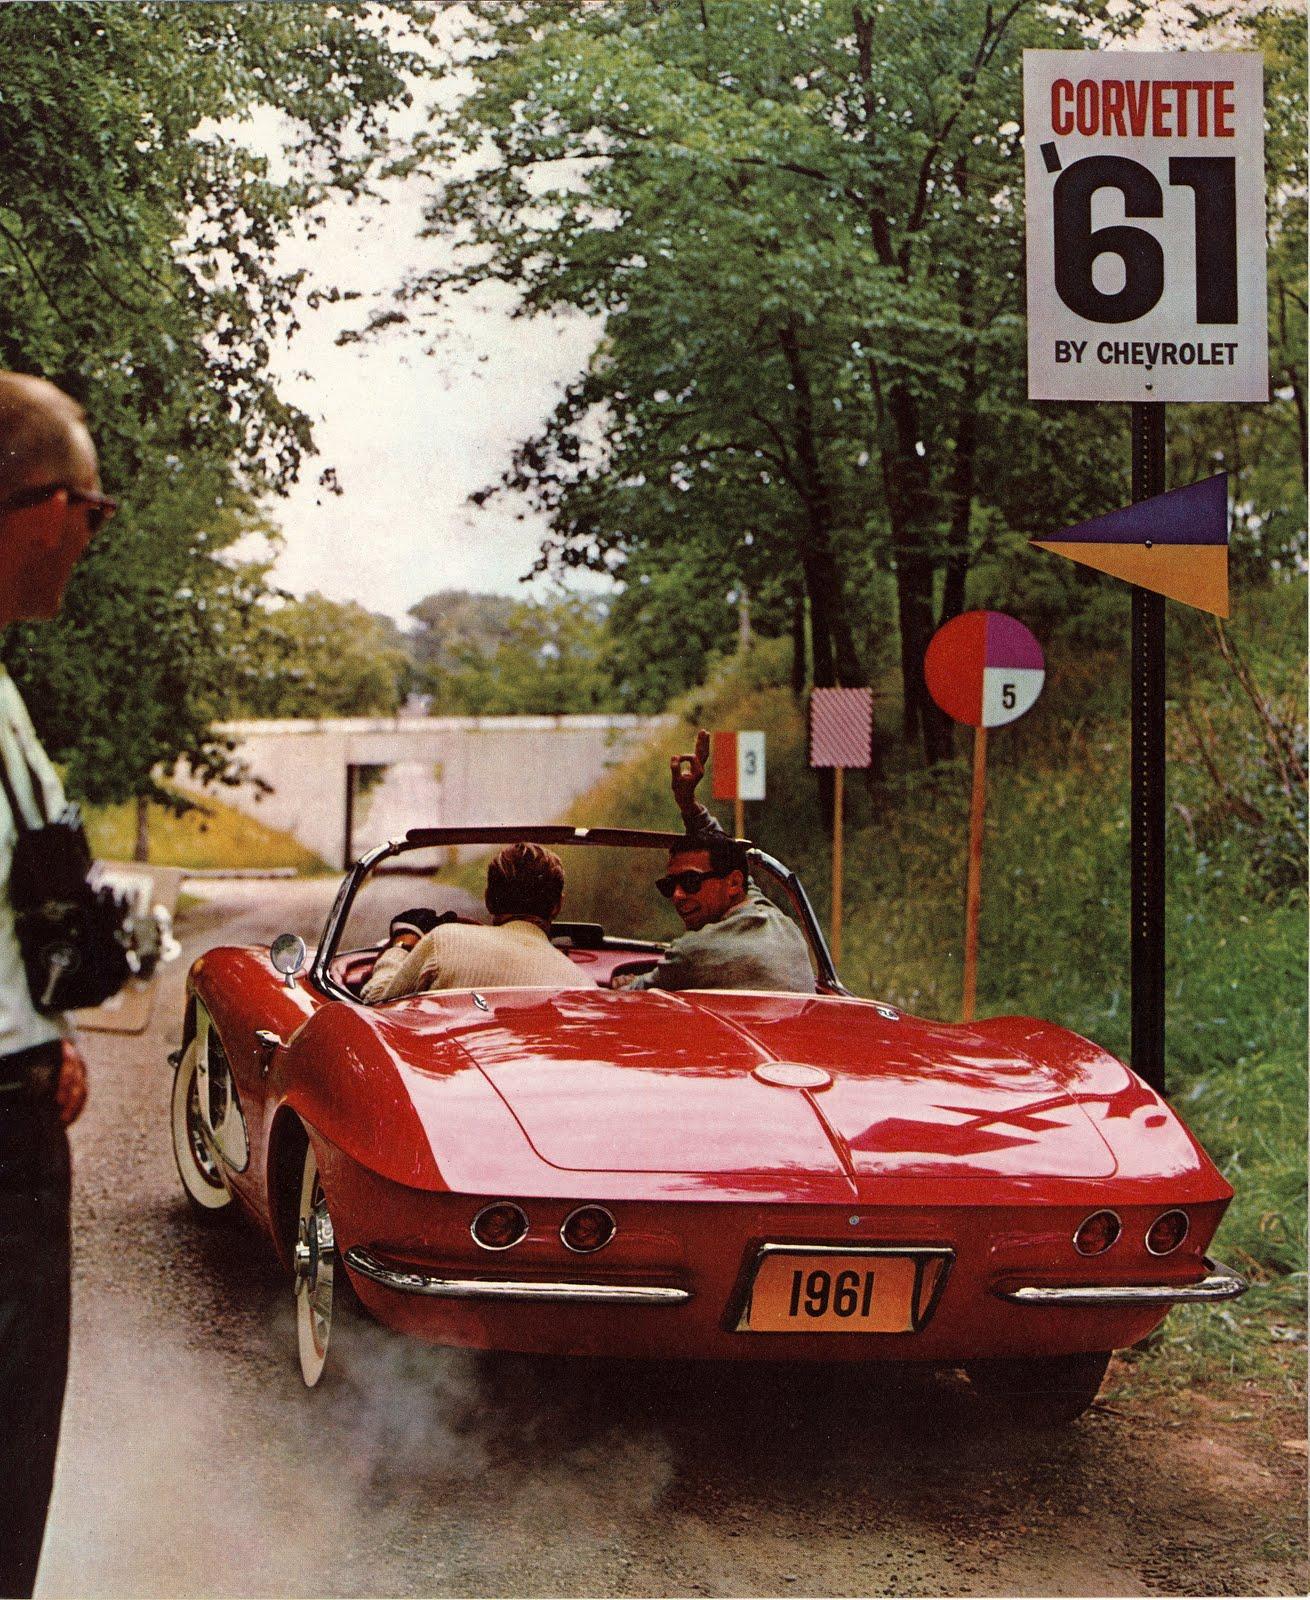 ['61+Corvette+Catalog+Cover]